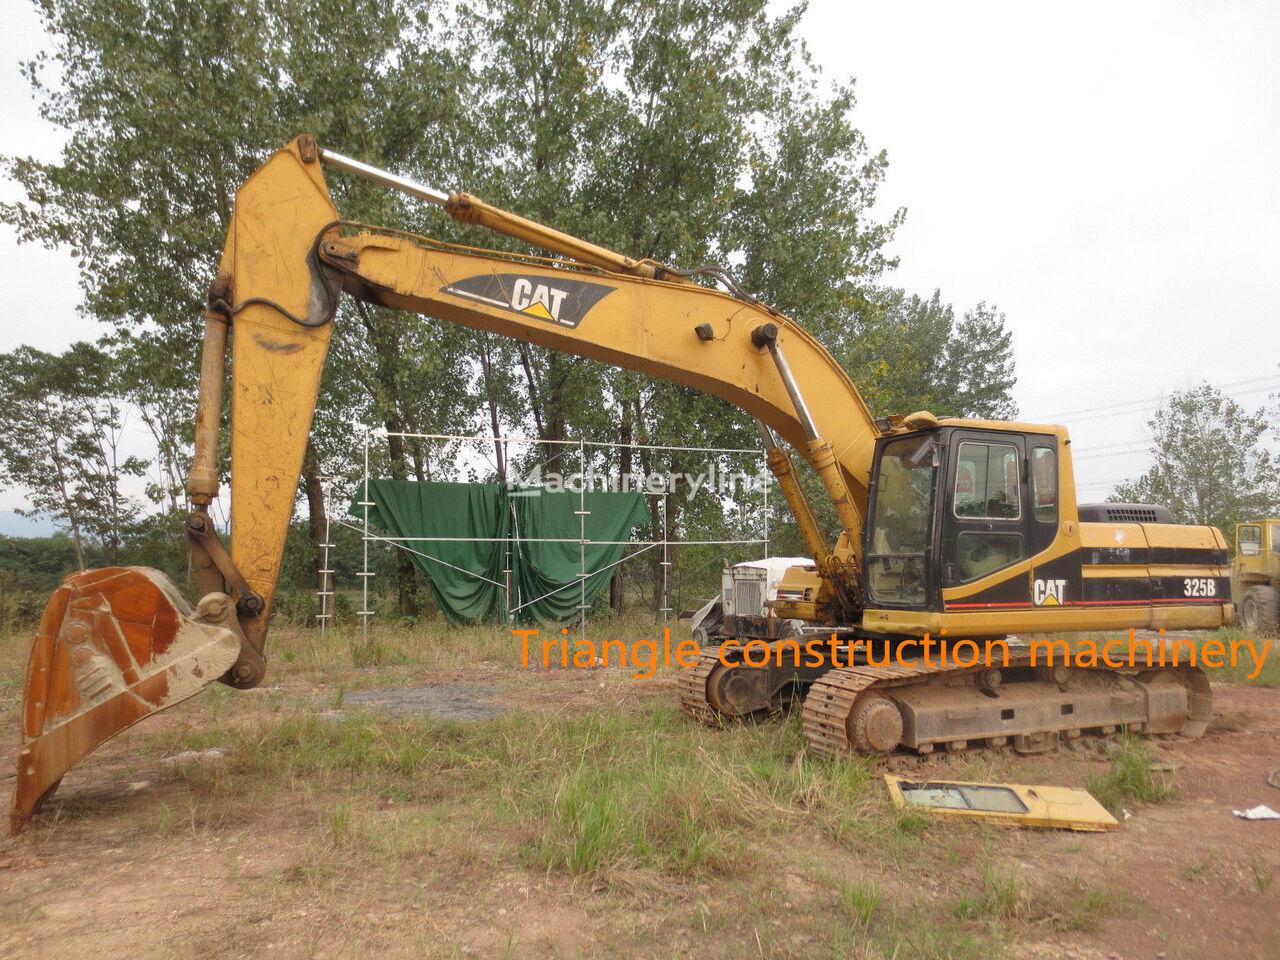 CATERPILLAR 325B tracked excavator